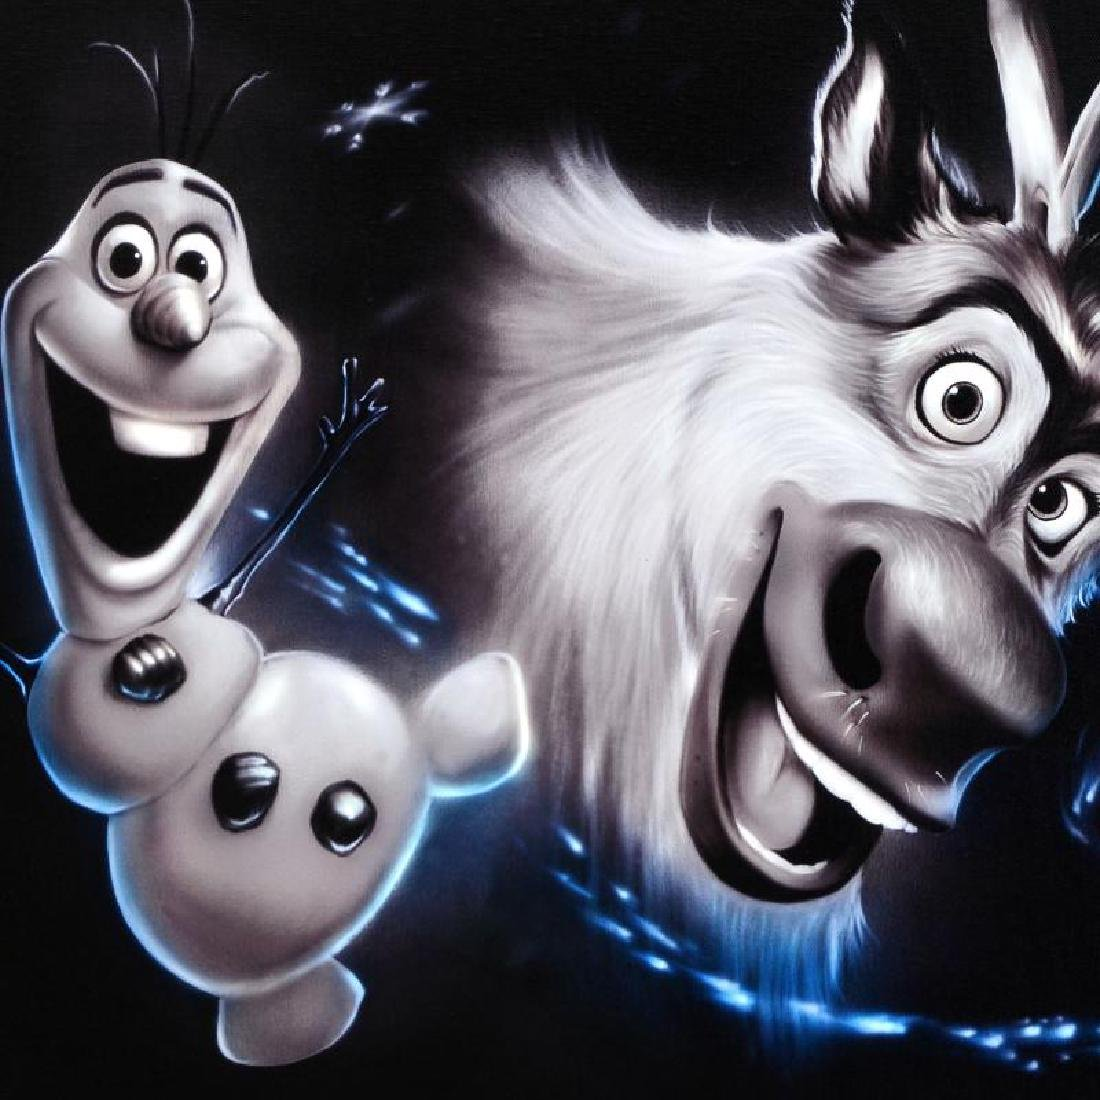 Olaf & Sven by Noah - 2